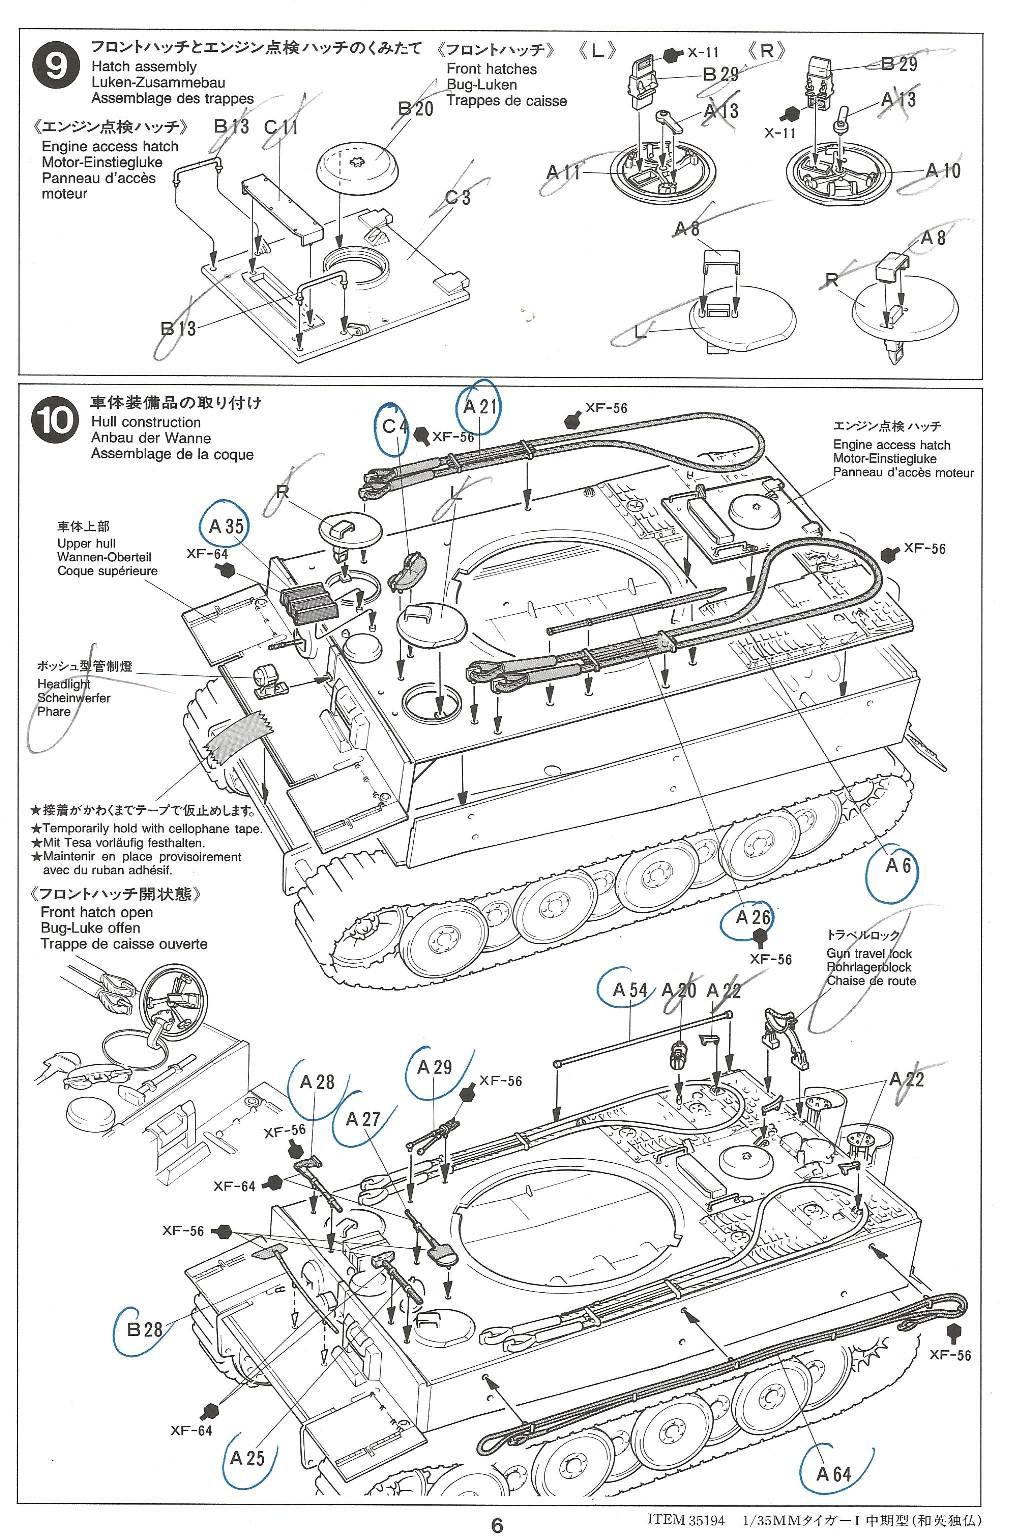 [Tamiya 1/35]  Tiger I mid production réf. 35194 Tigremid-plan-6